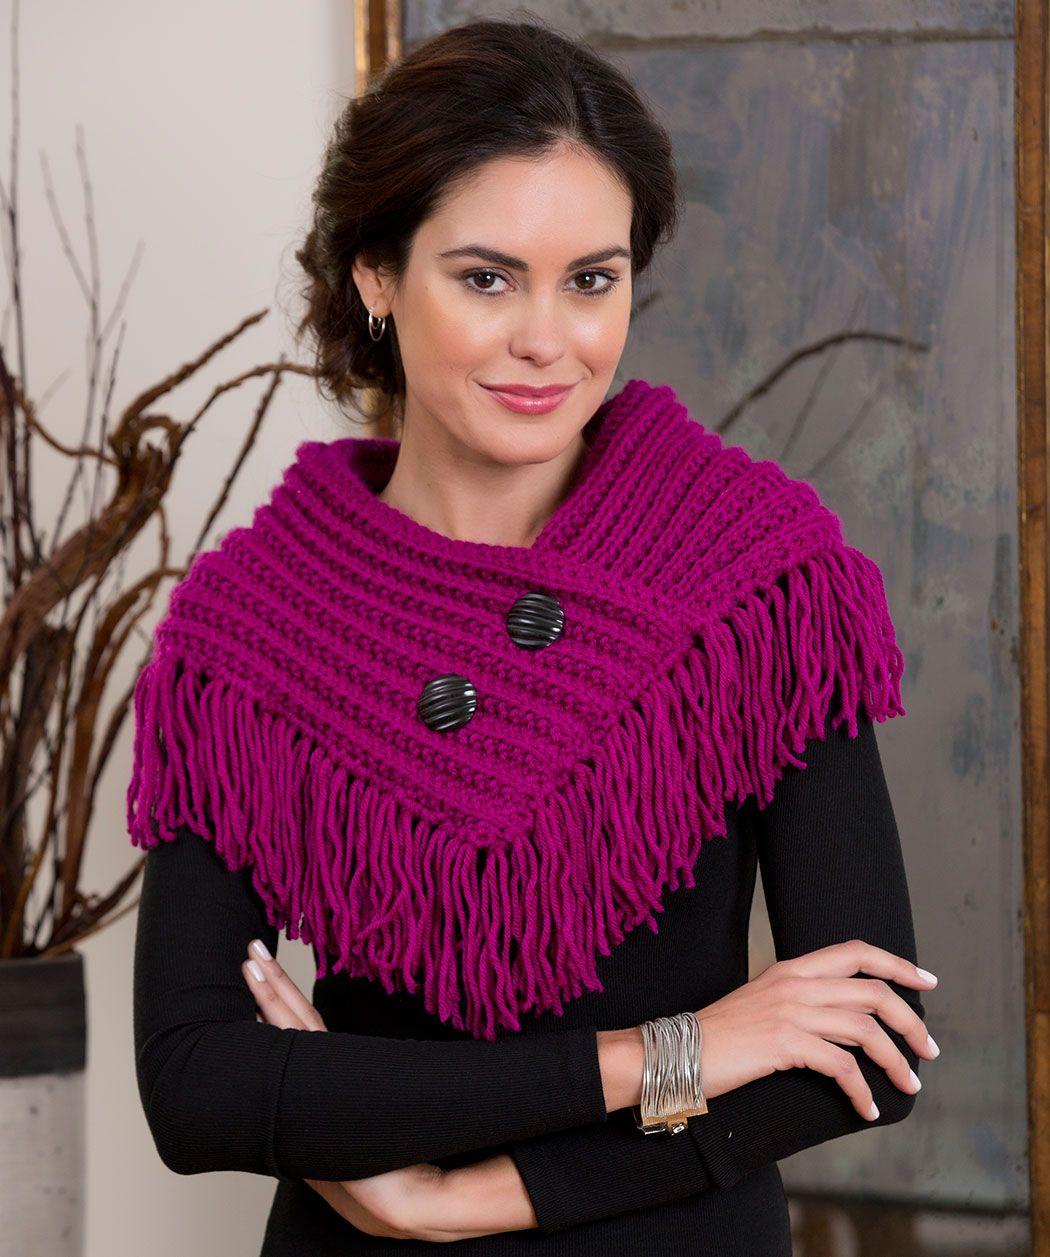 fringed cowl knitting pattern knit redheartyarns handarbeit stricken pinterest schals. Black Bedroom Furniture Sets. Home Design Ideas